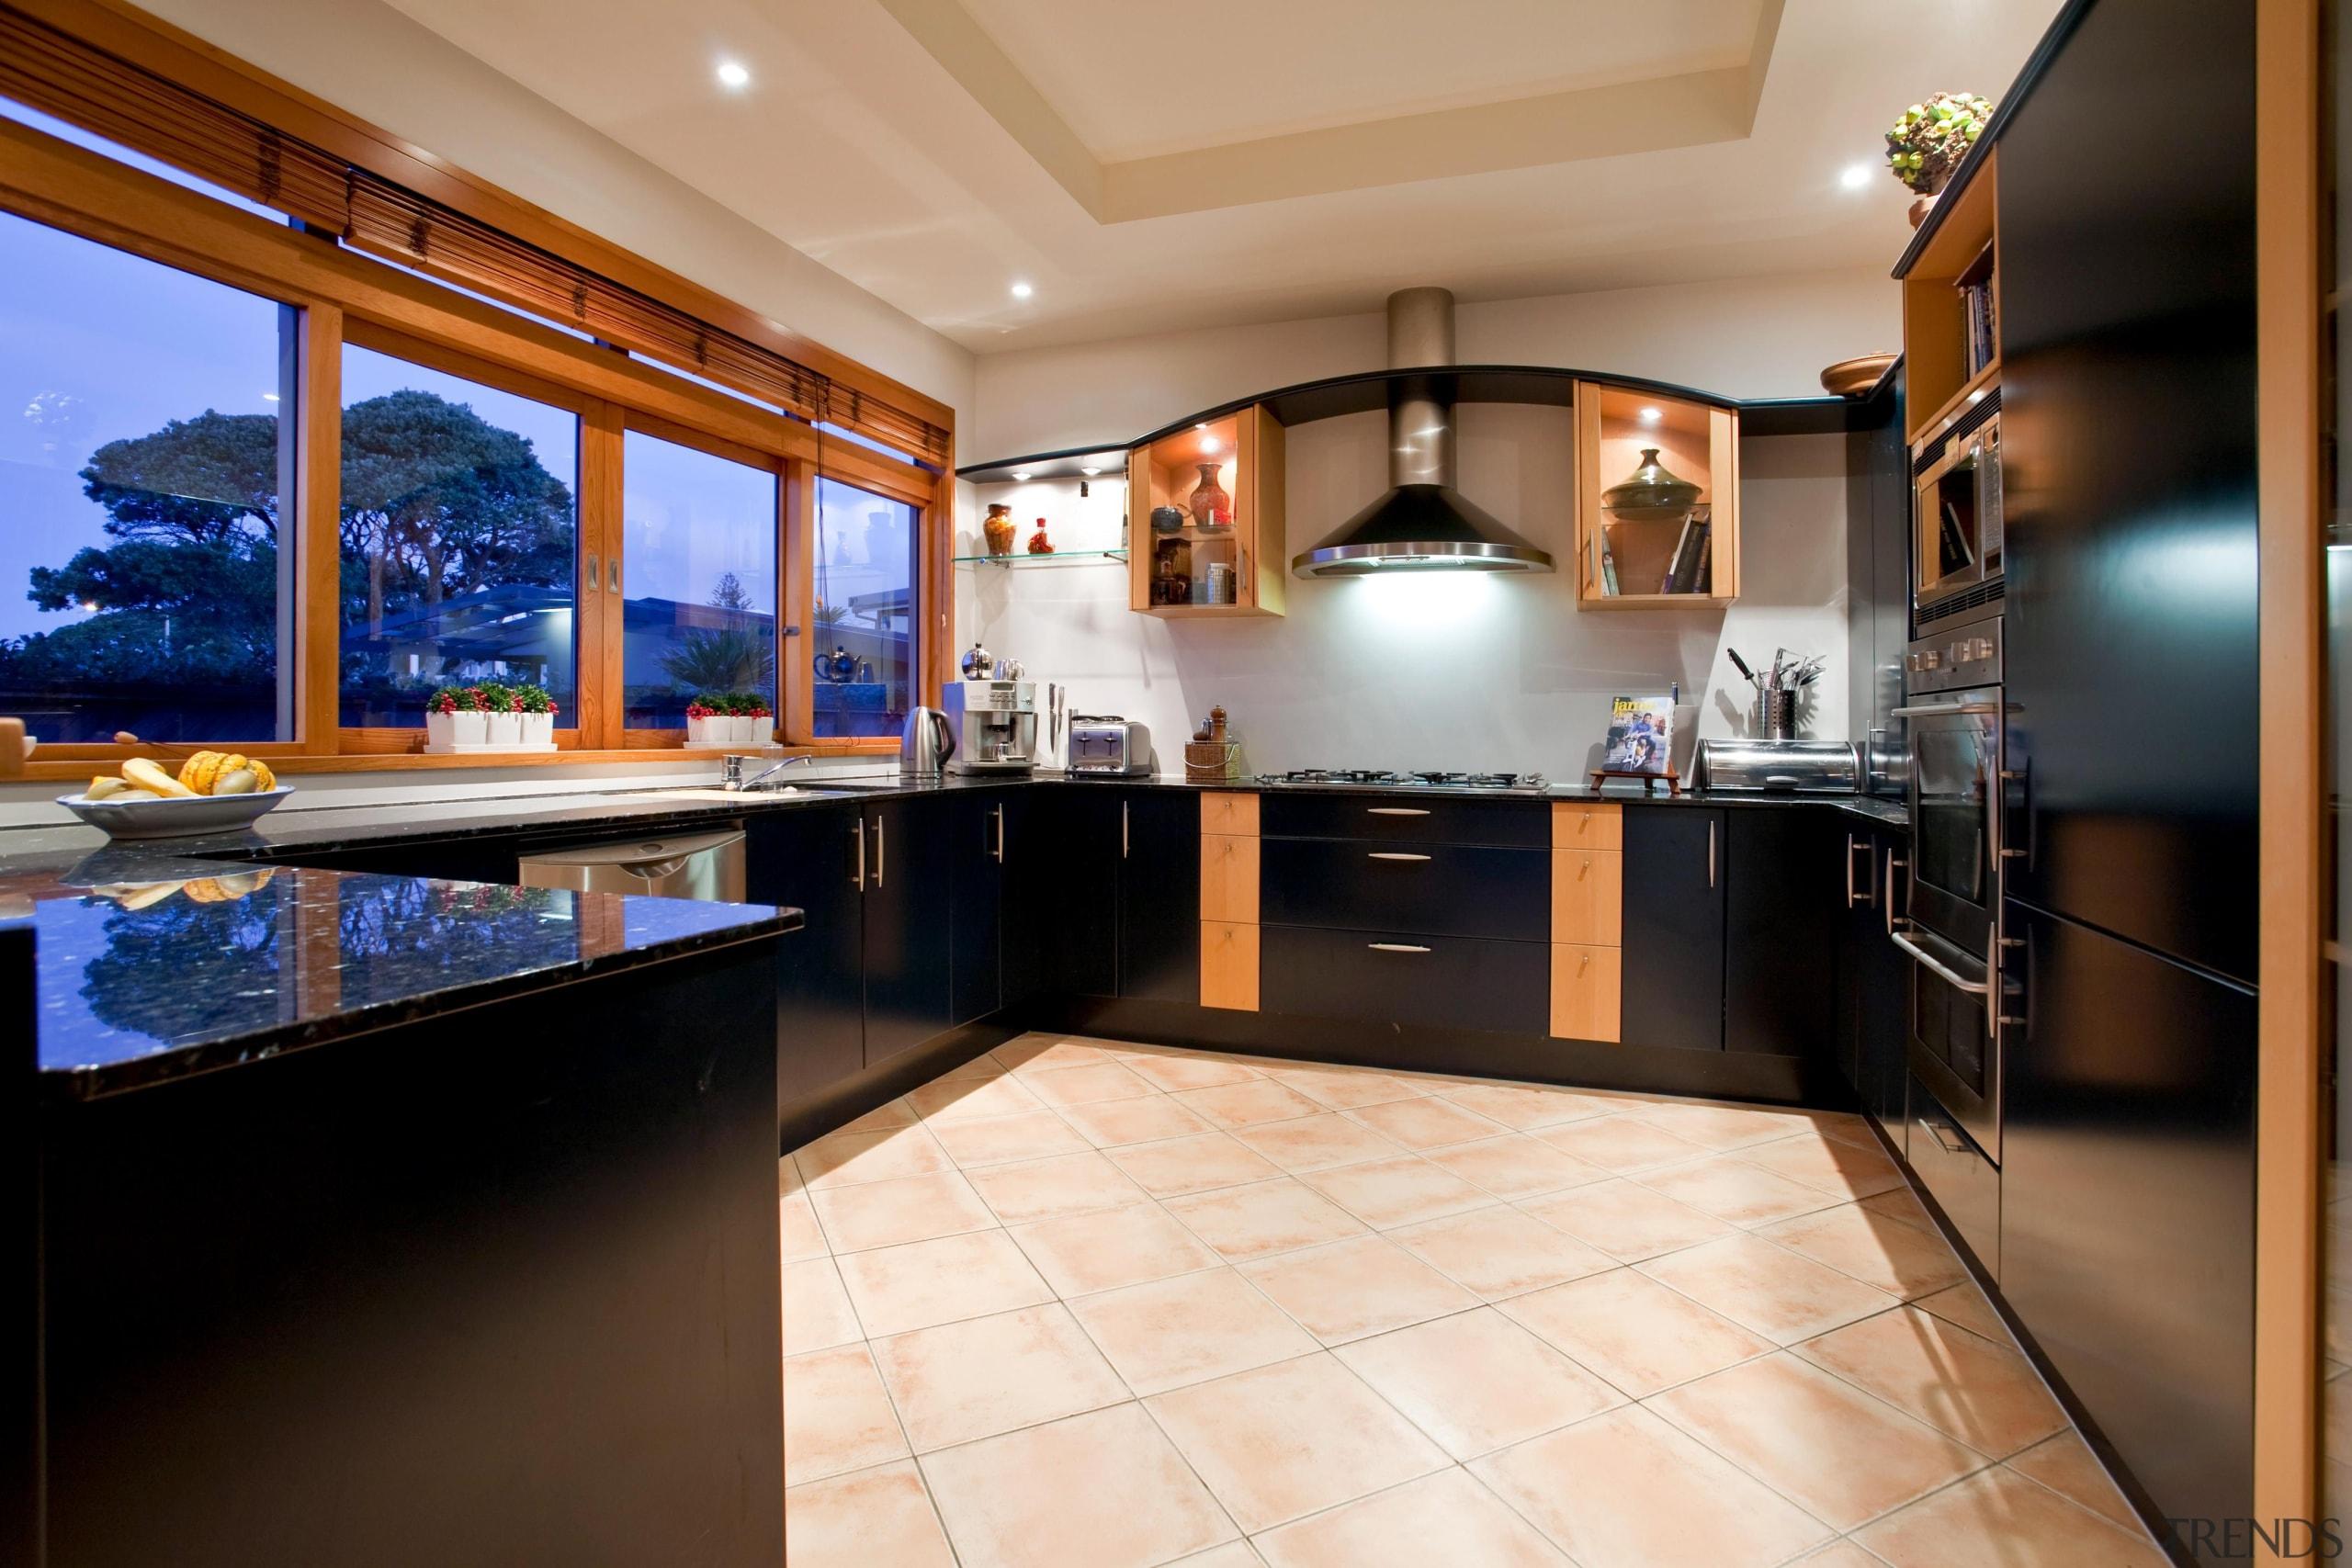 Kitchen - countertop | estate | interior design countertop, estate, interior design, kitchen, real estate, room, black